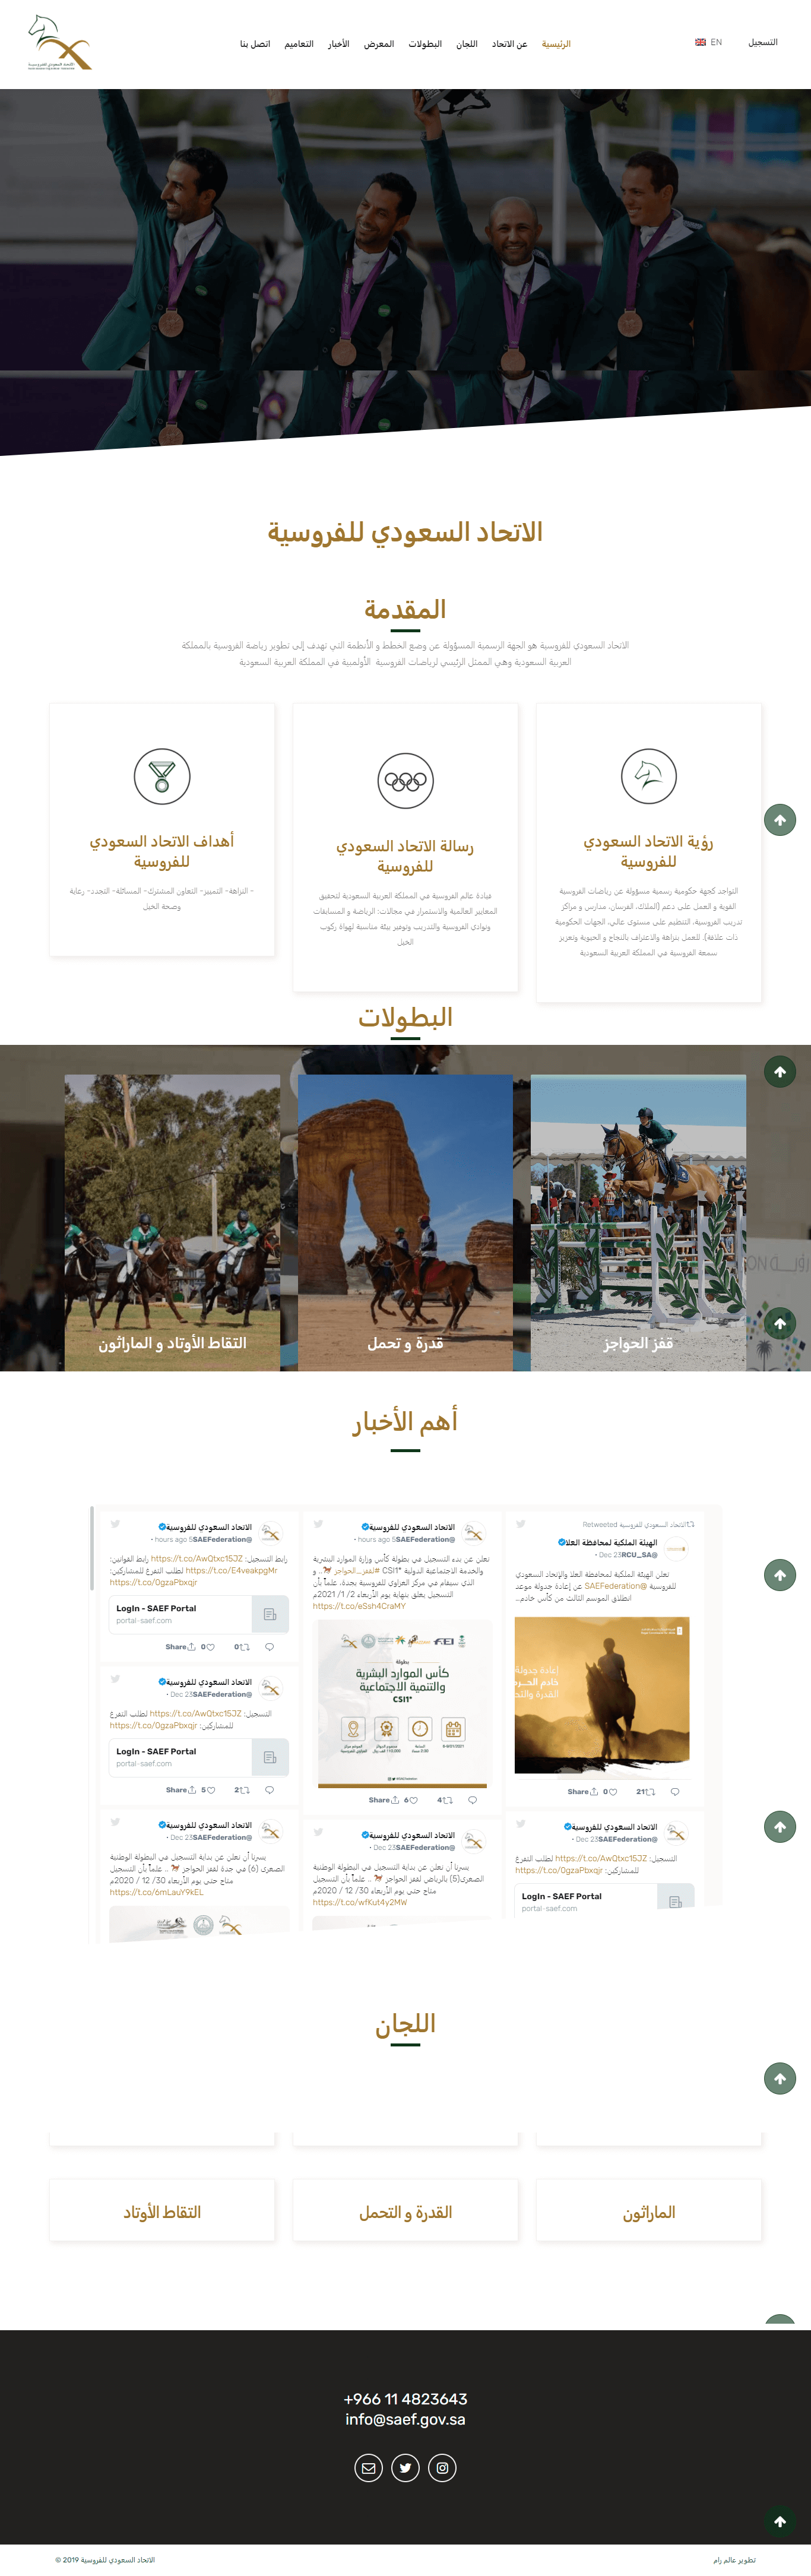 Saudi Arabian Equestrian Federation الاتحاد السعودي للفروسية